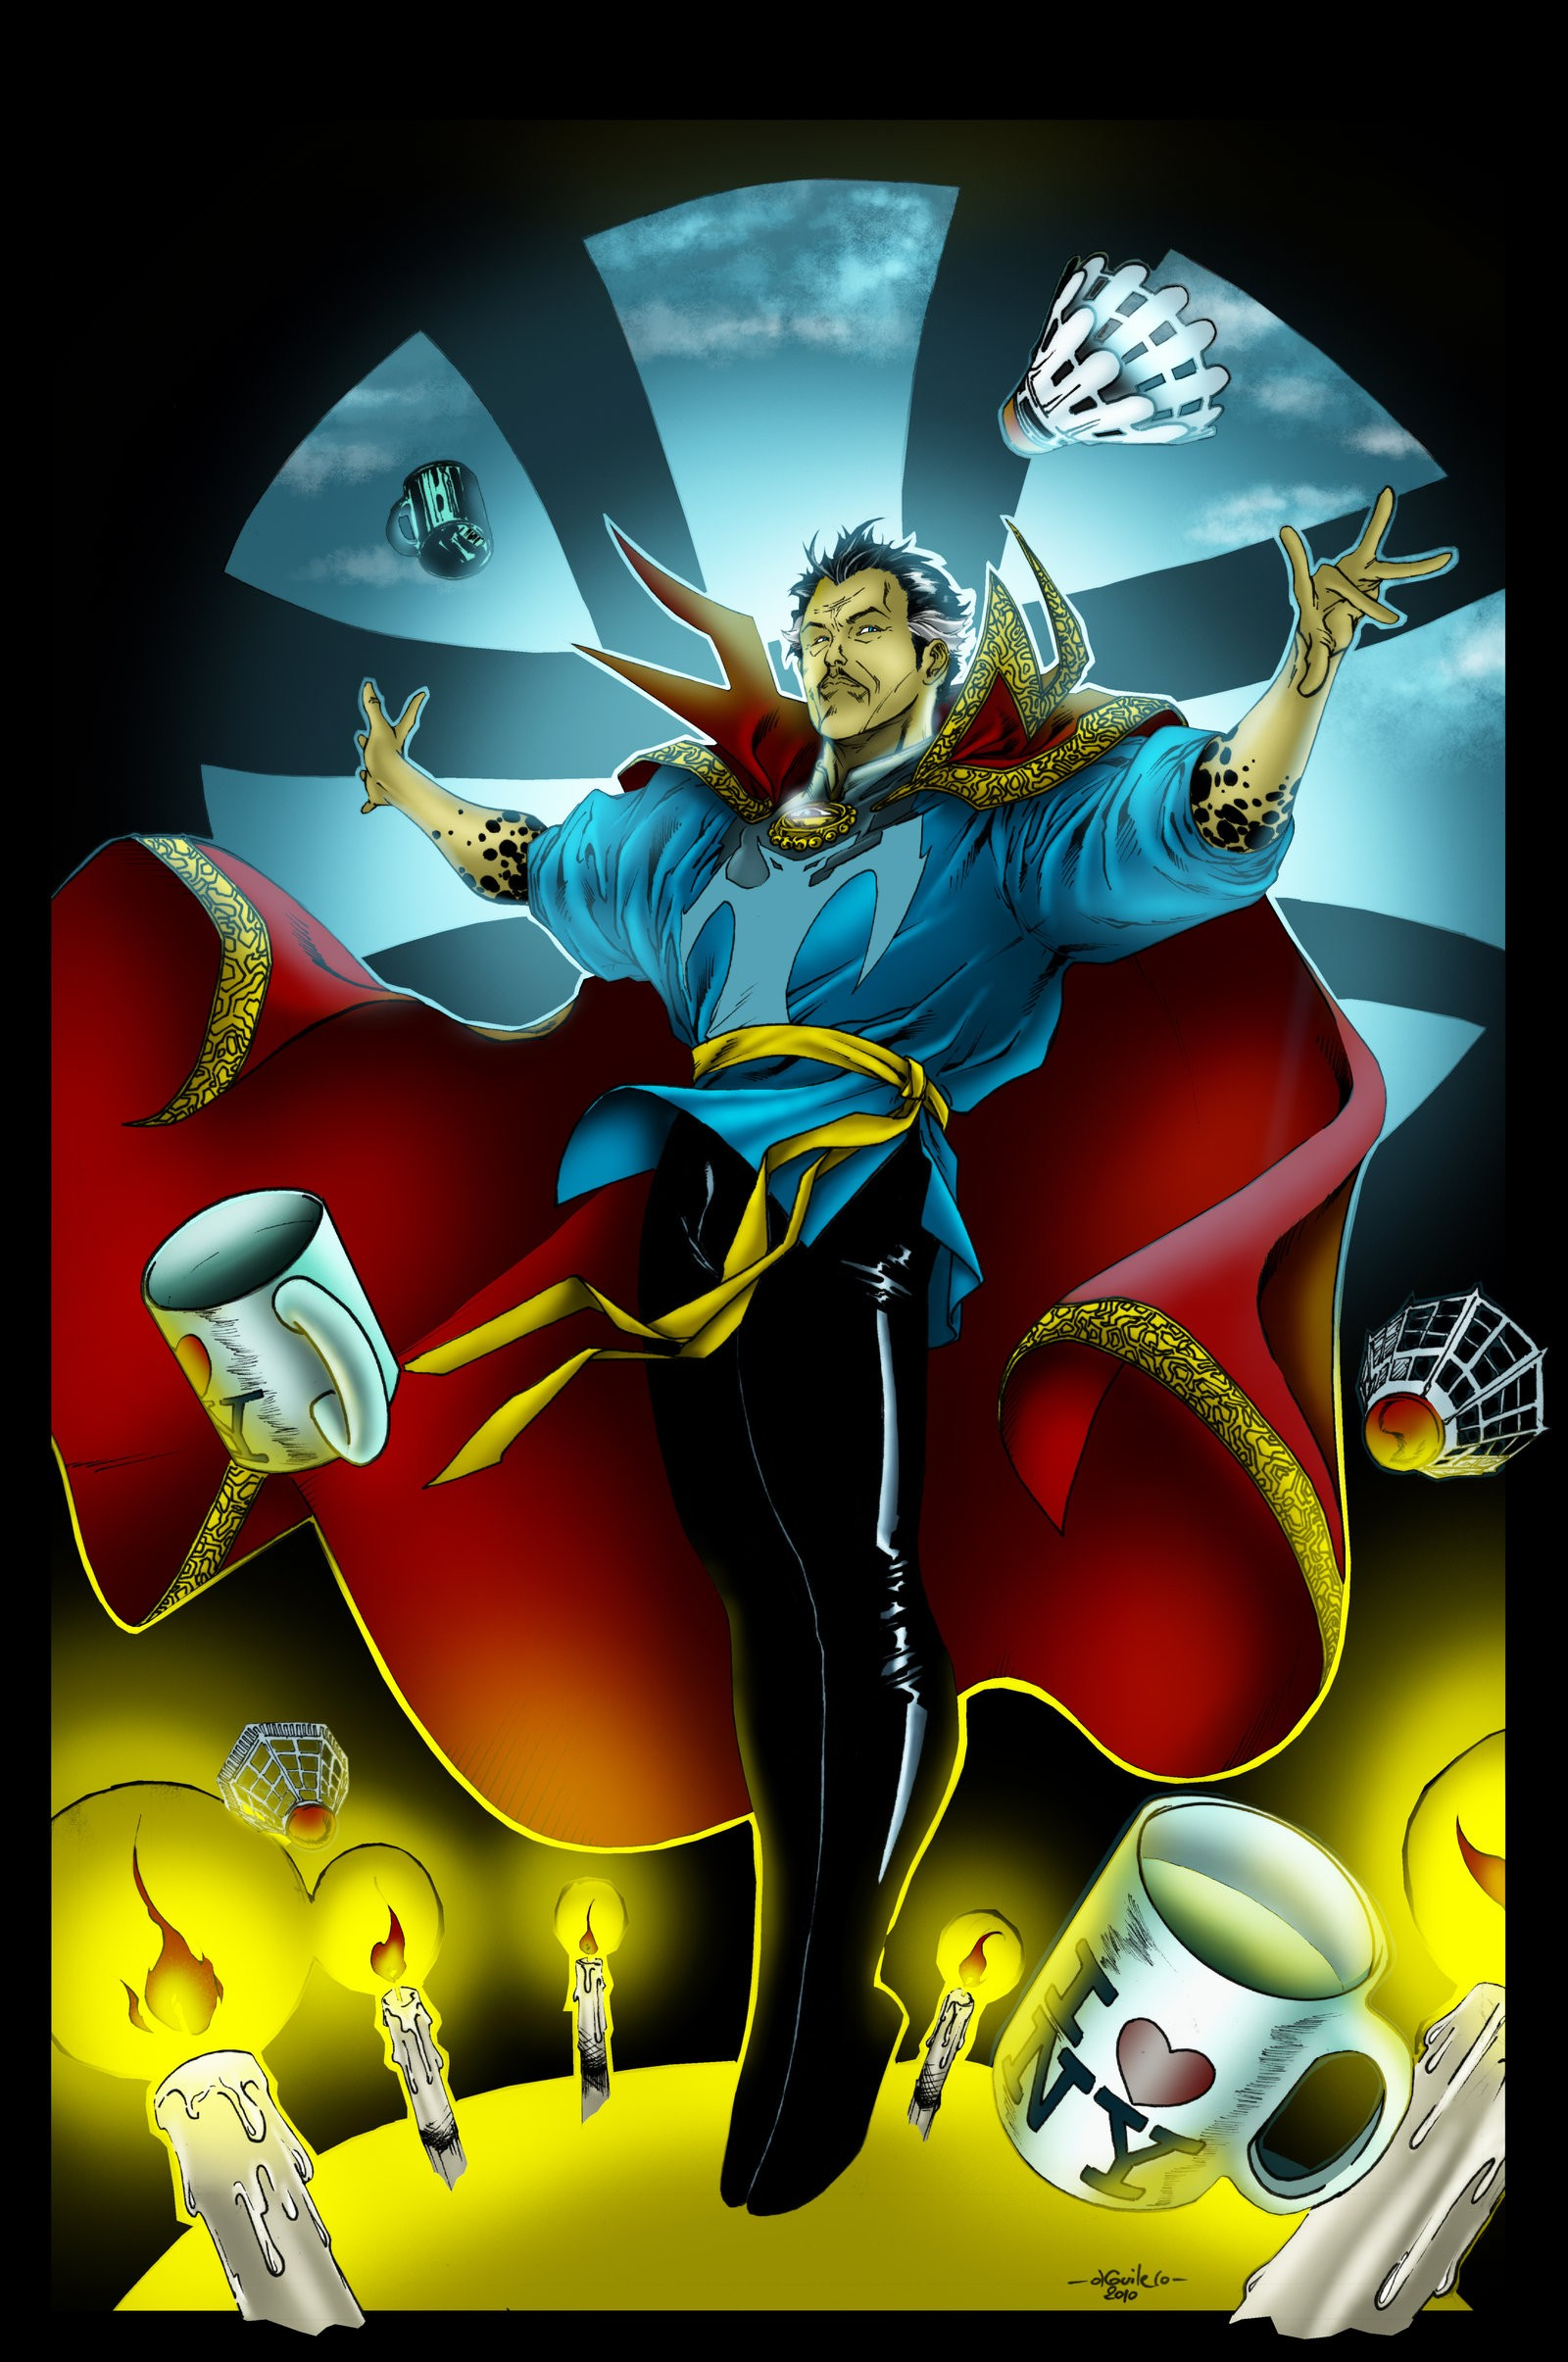 Dr. Strange wallpaper ·① Download free cool High ...